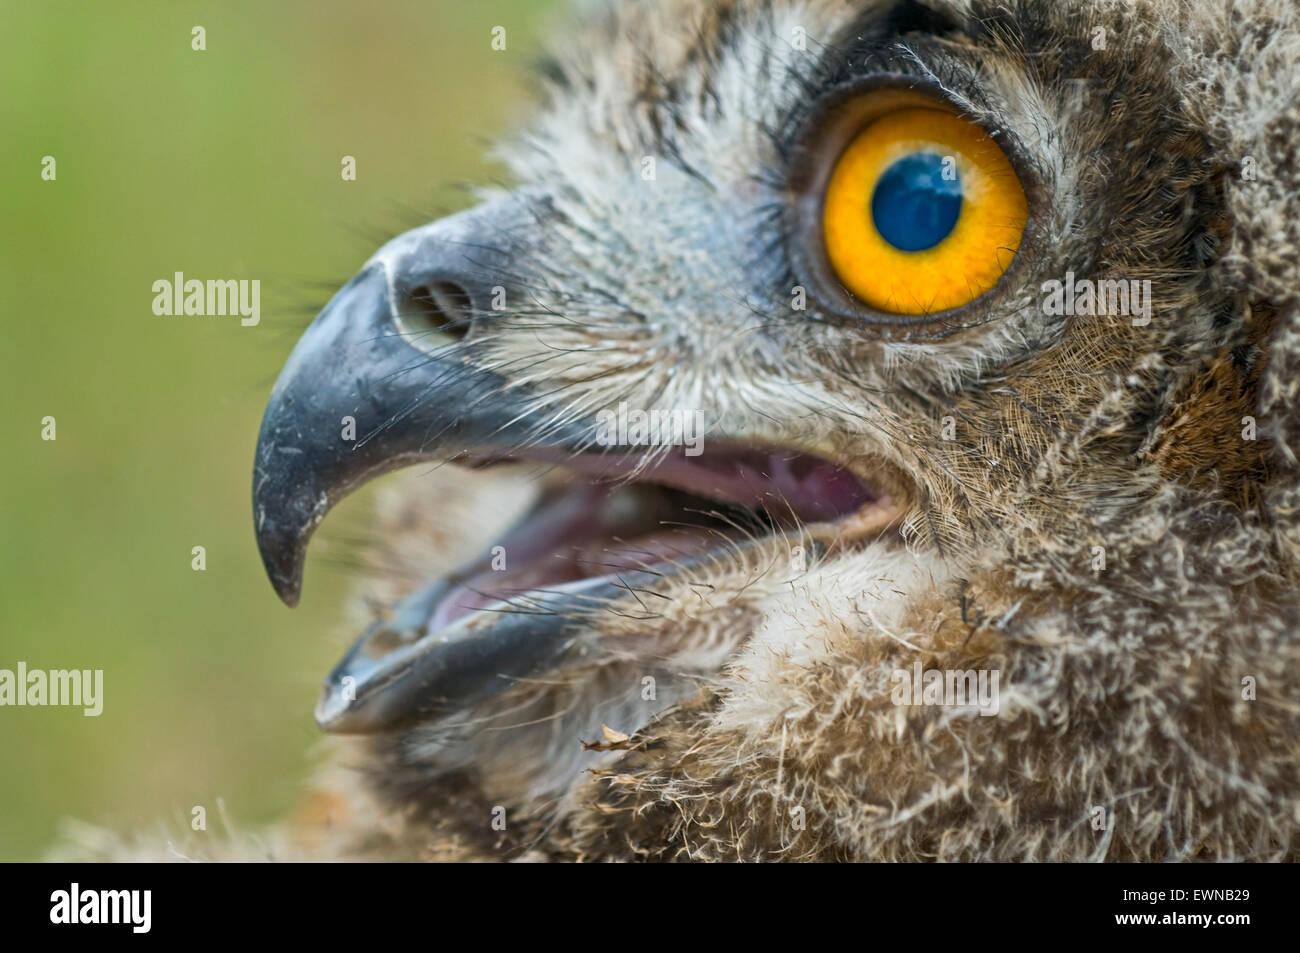 Eurasian Eagle Owl (Bubo bubo), portrait - Stock Image